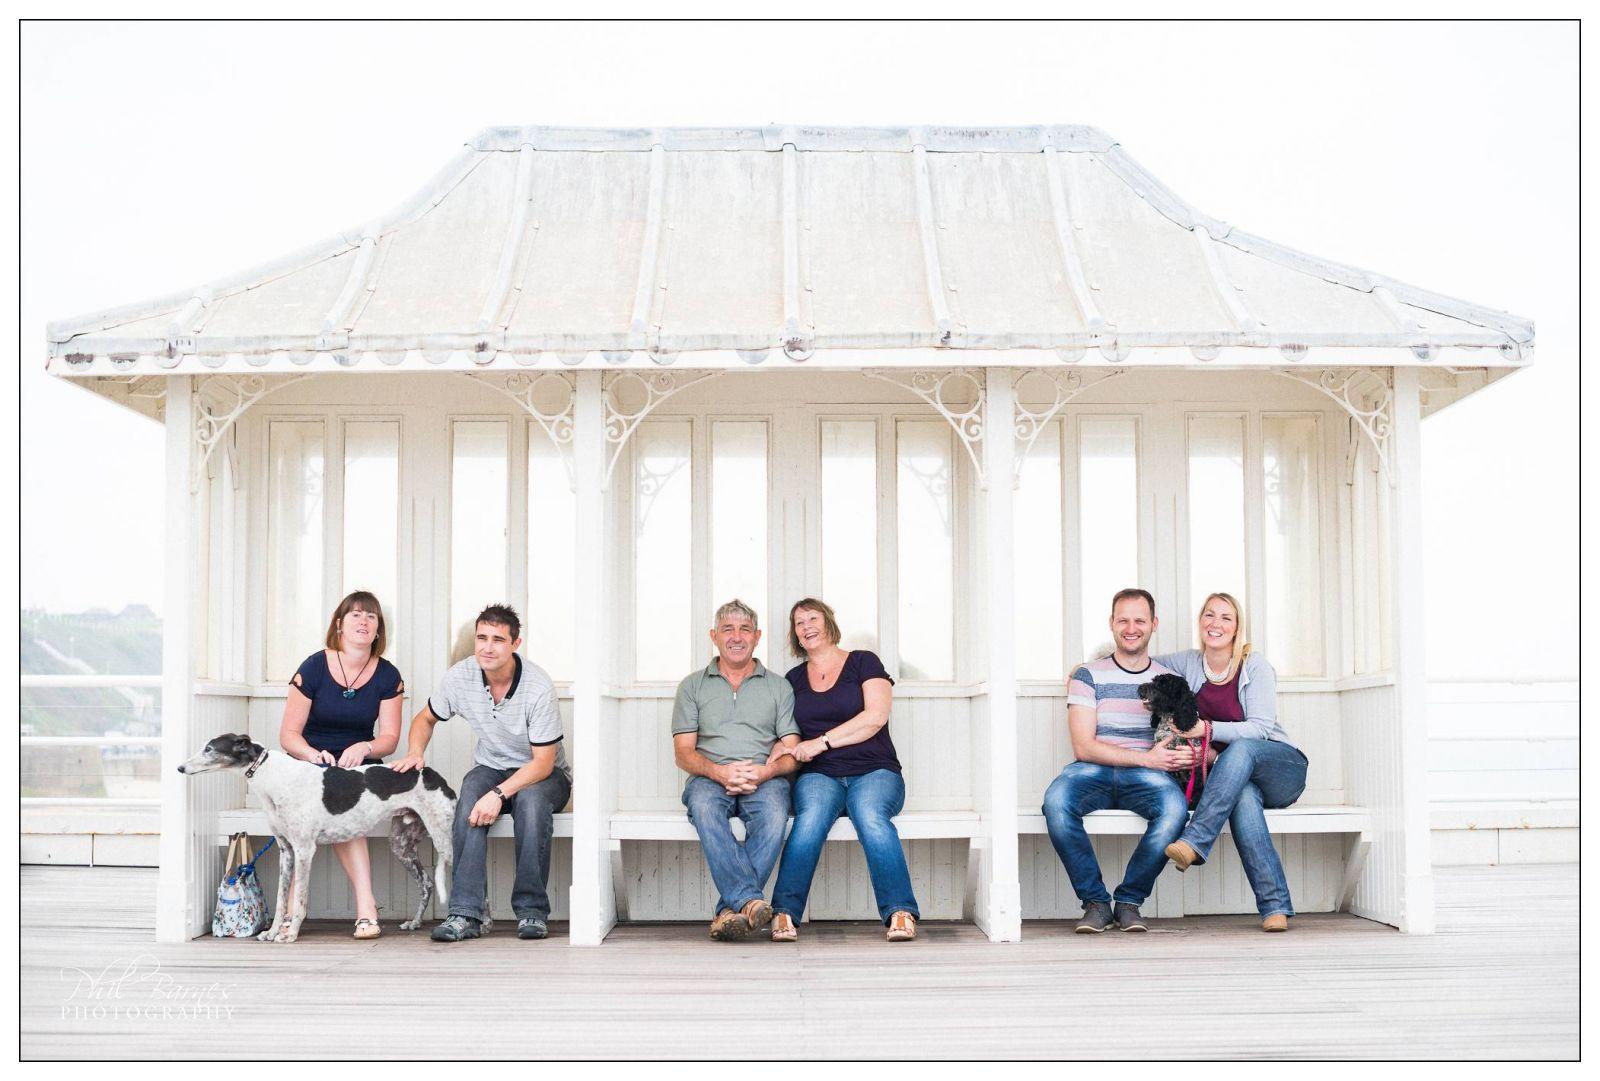 CROMER PIER FAMILY PORTRAIT PHOTOGRAPHY